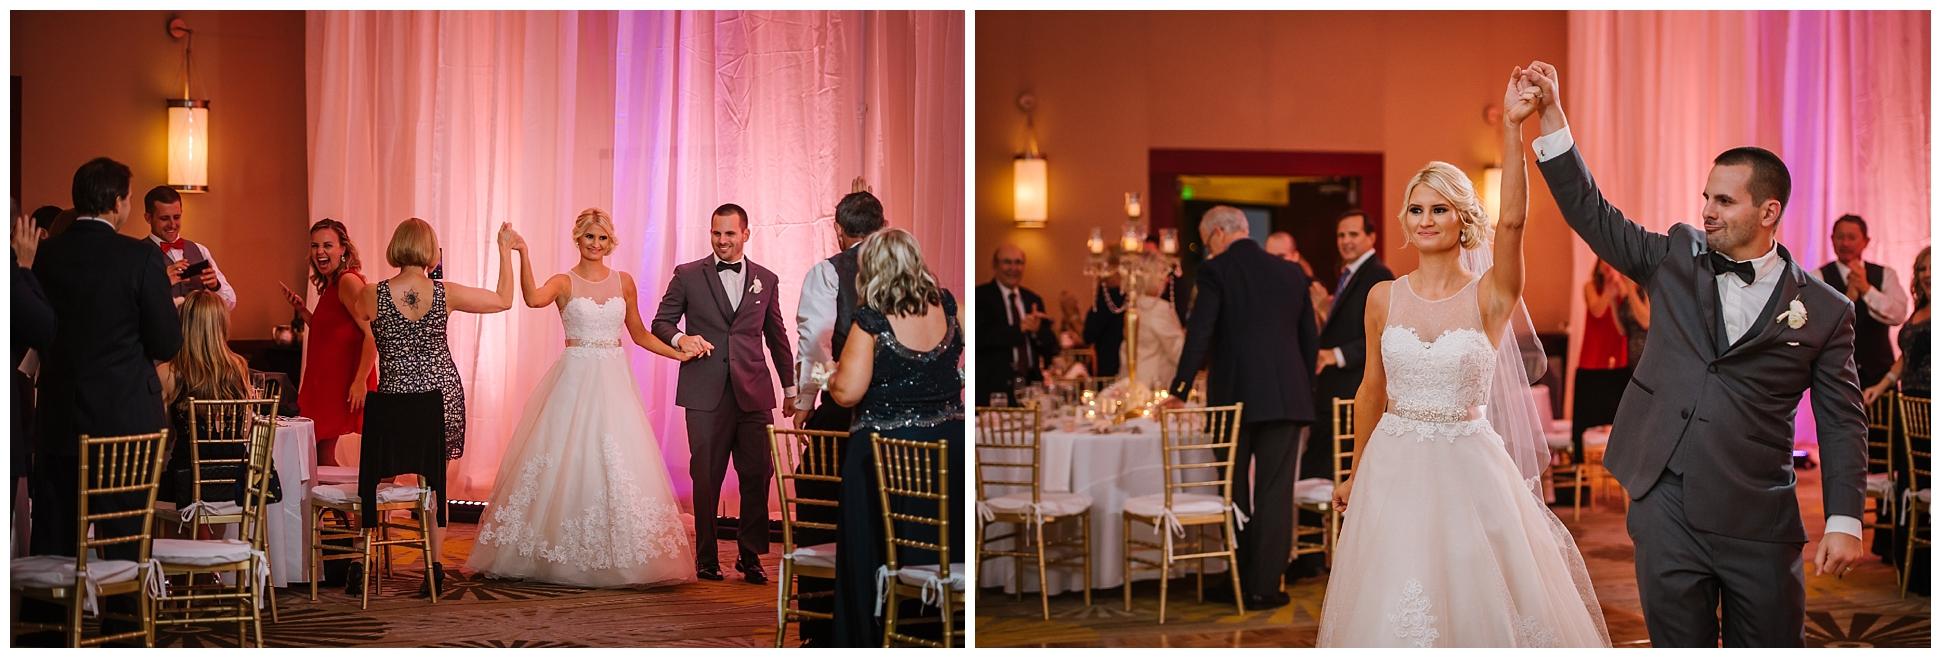 Sarasota-wedding-photographer-hyatt-regency-blush_0058.jpg